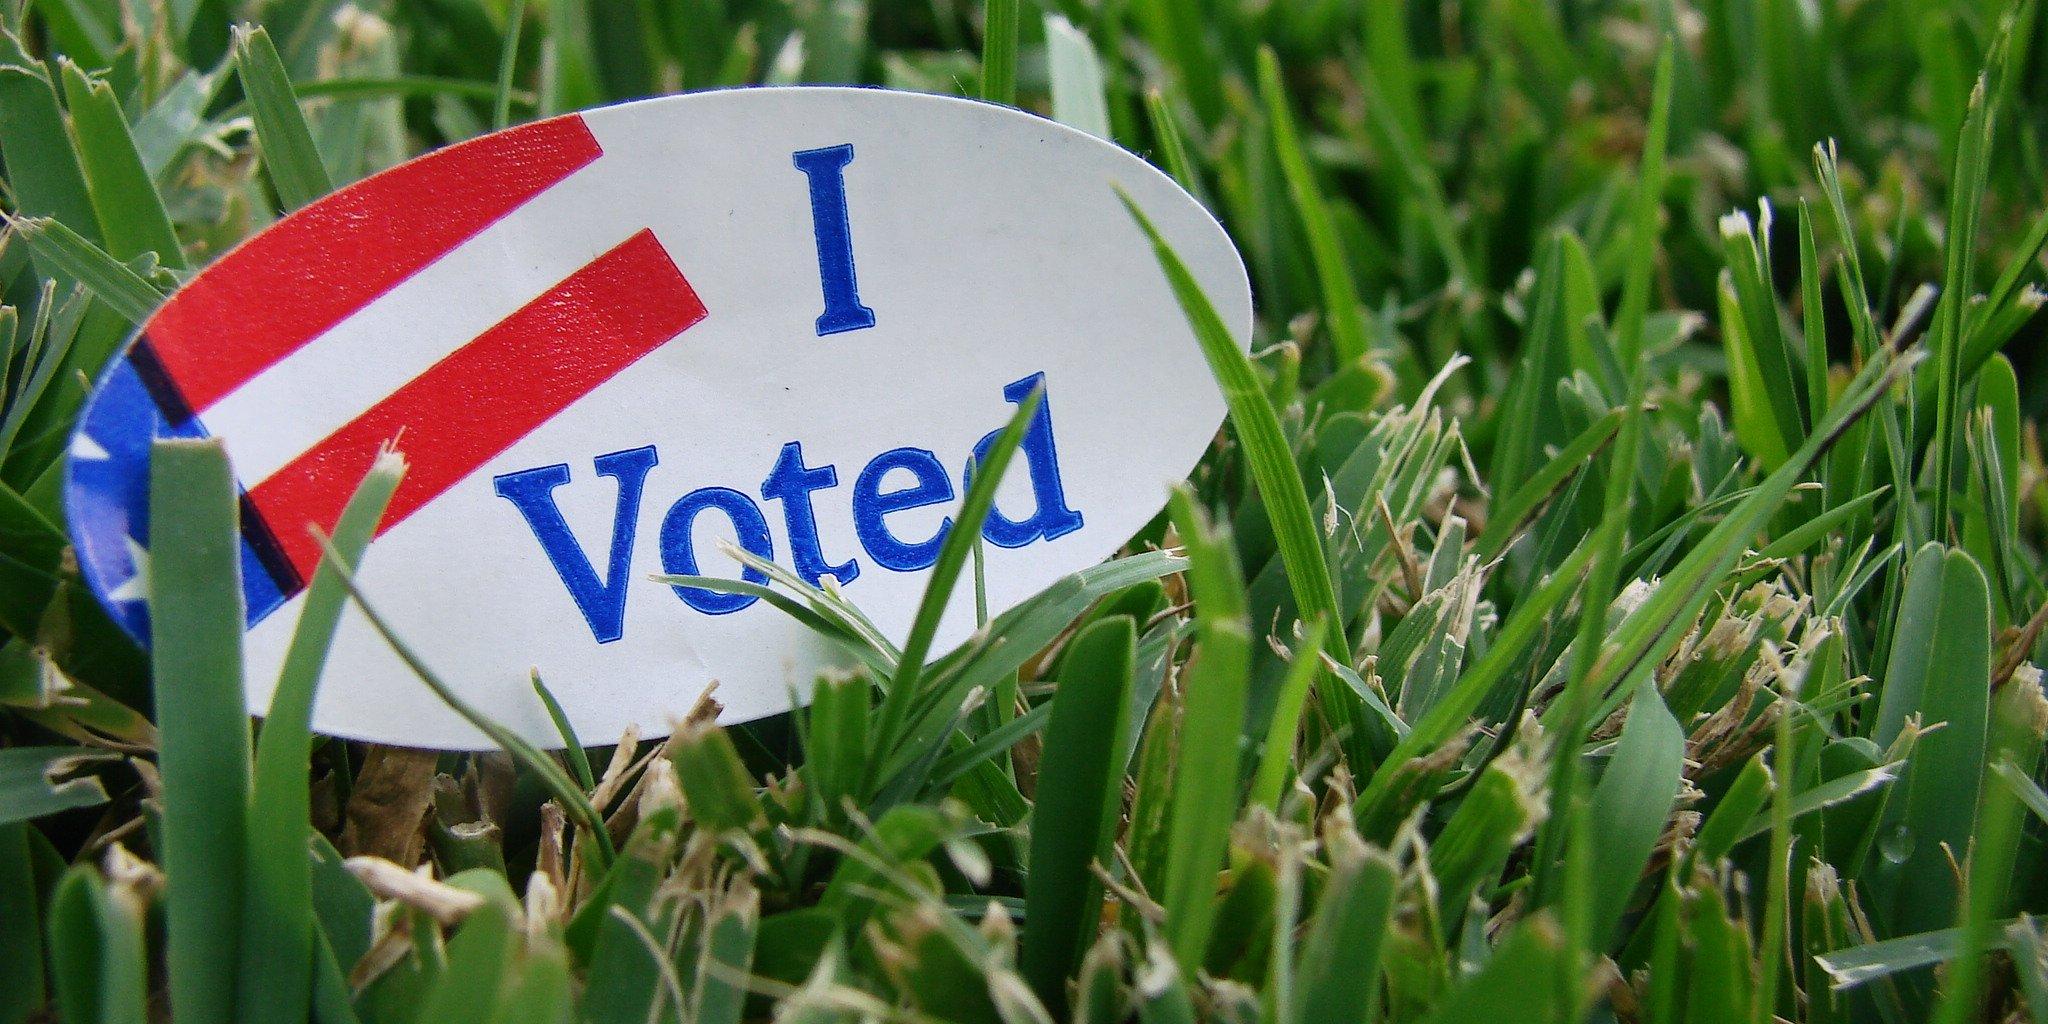 Voting sticker in the grass